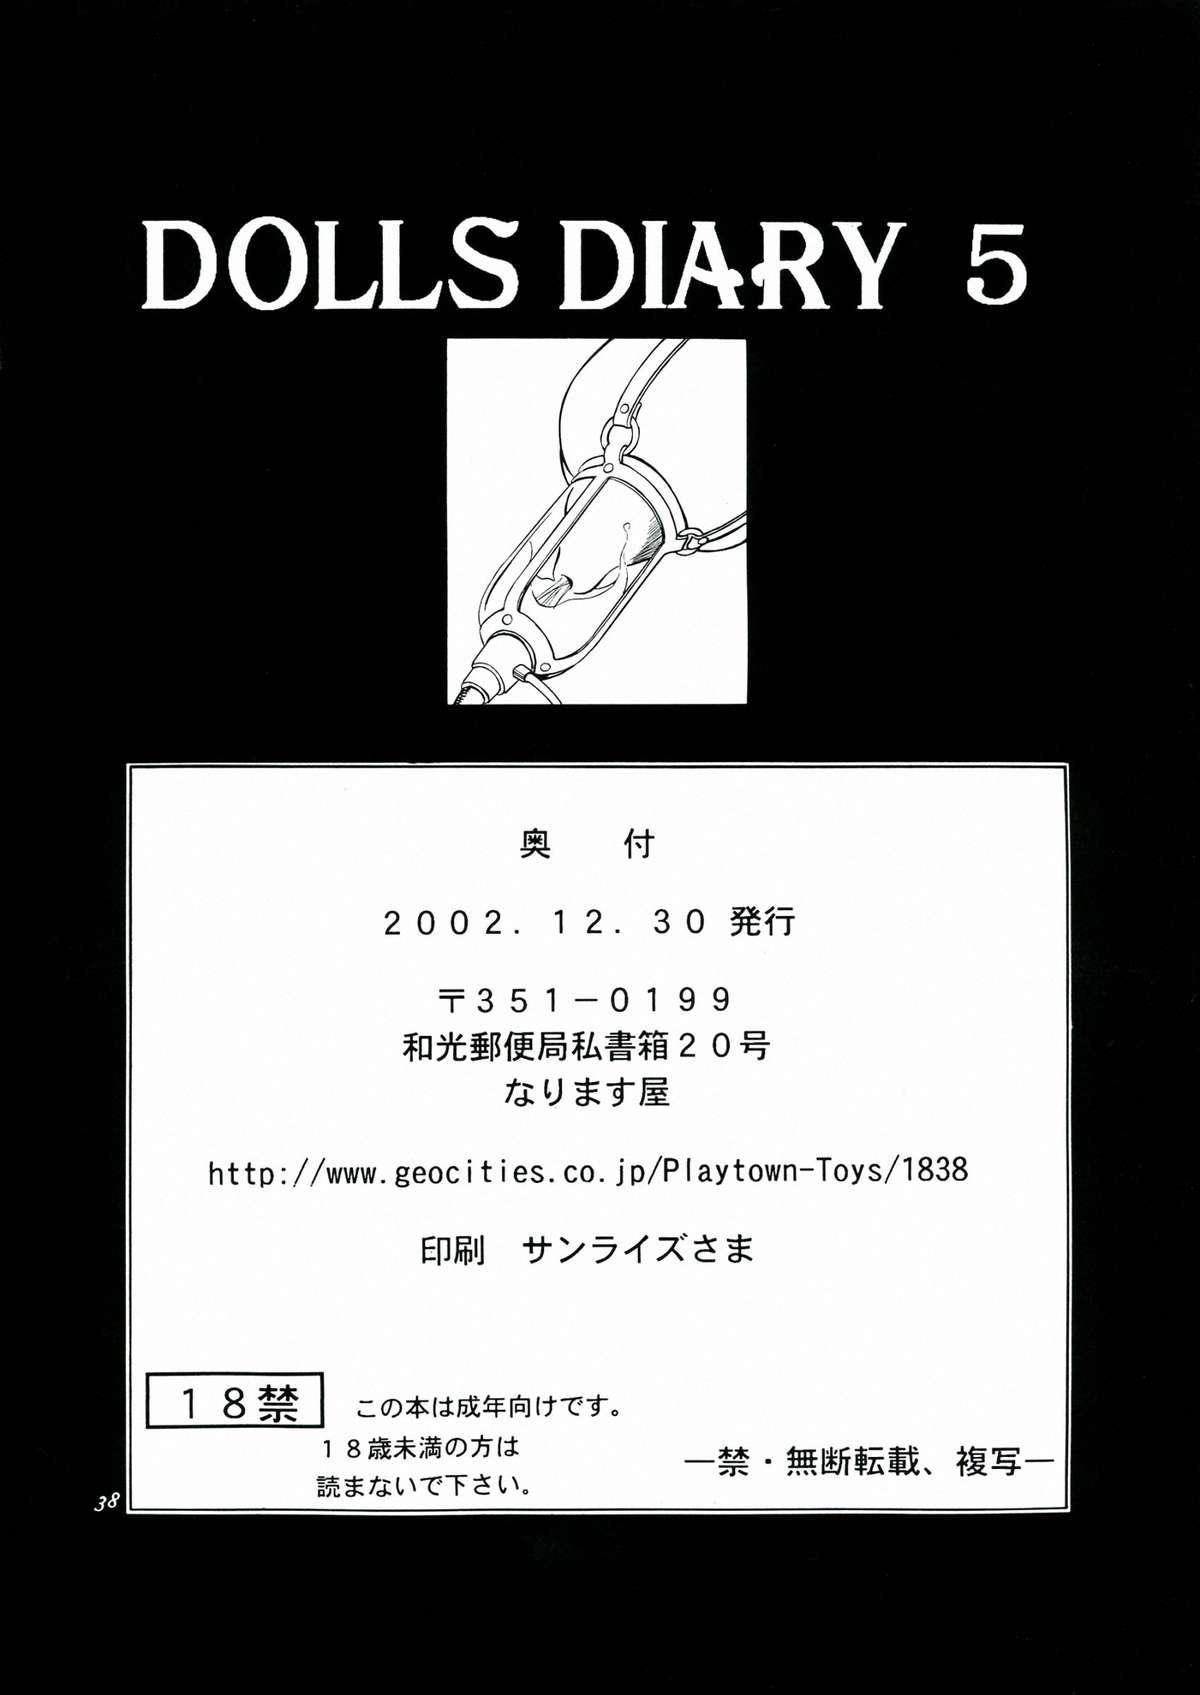 DOLLS DIARY 5 38